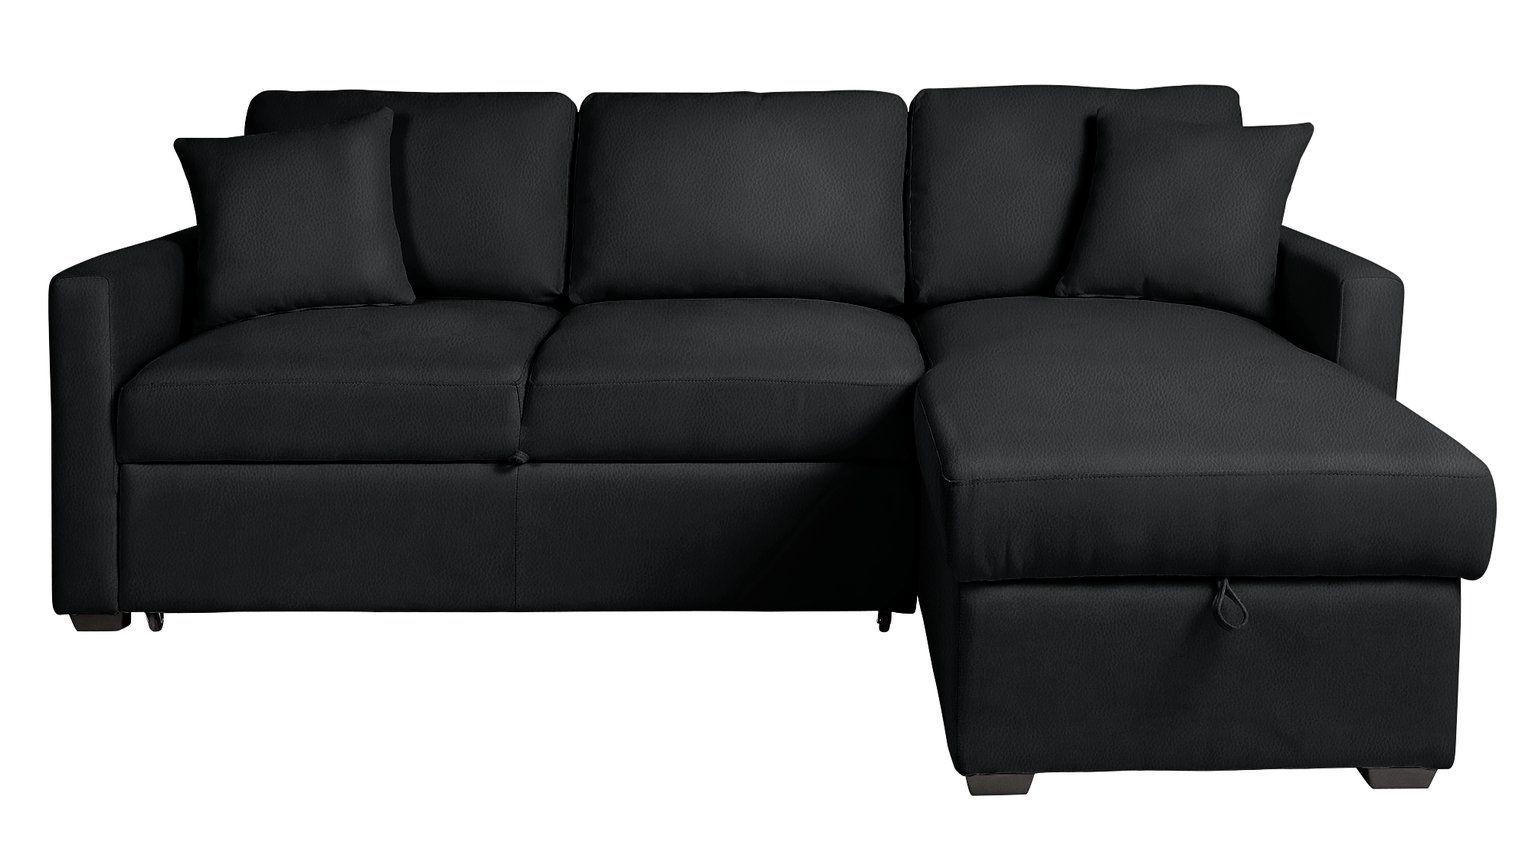 Argos Home Reagan Right Corner Faux Leather Sofa Bed Black Argos Home Reagan Right Corner Faux Leather Sofa Bed In 2020 Leather Sofa Bed Sofa Bed Black Leather Sofa